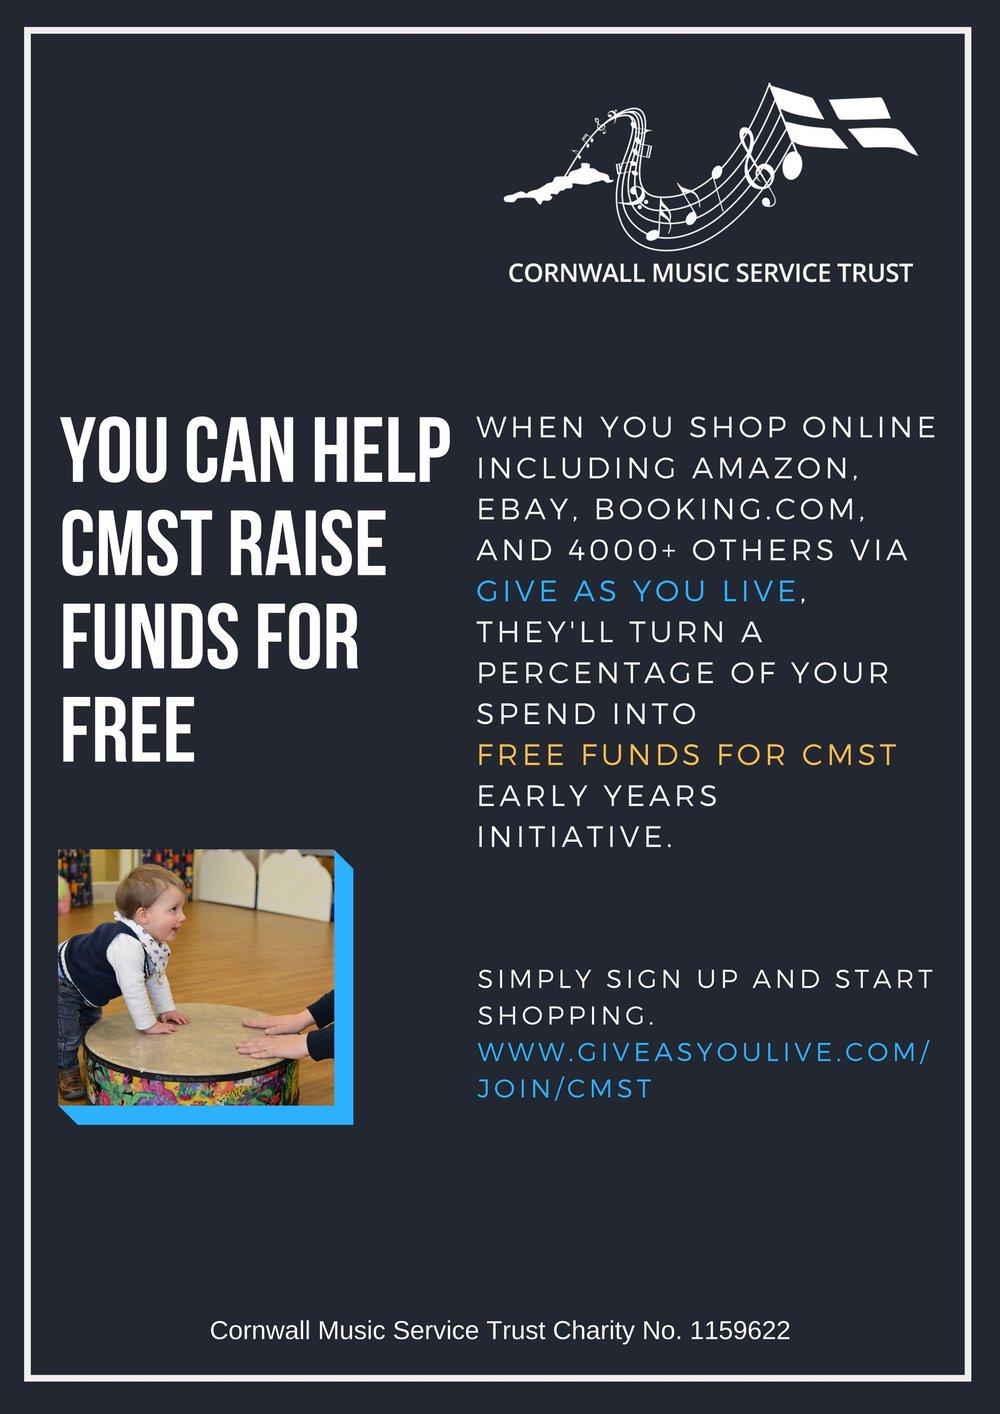 CMST GAYL Poster 1.jpg